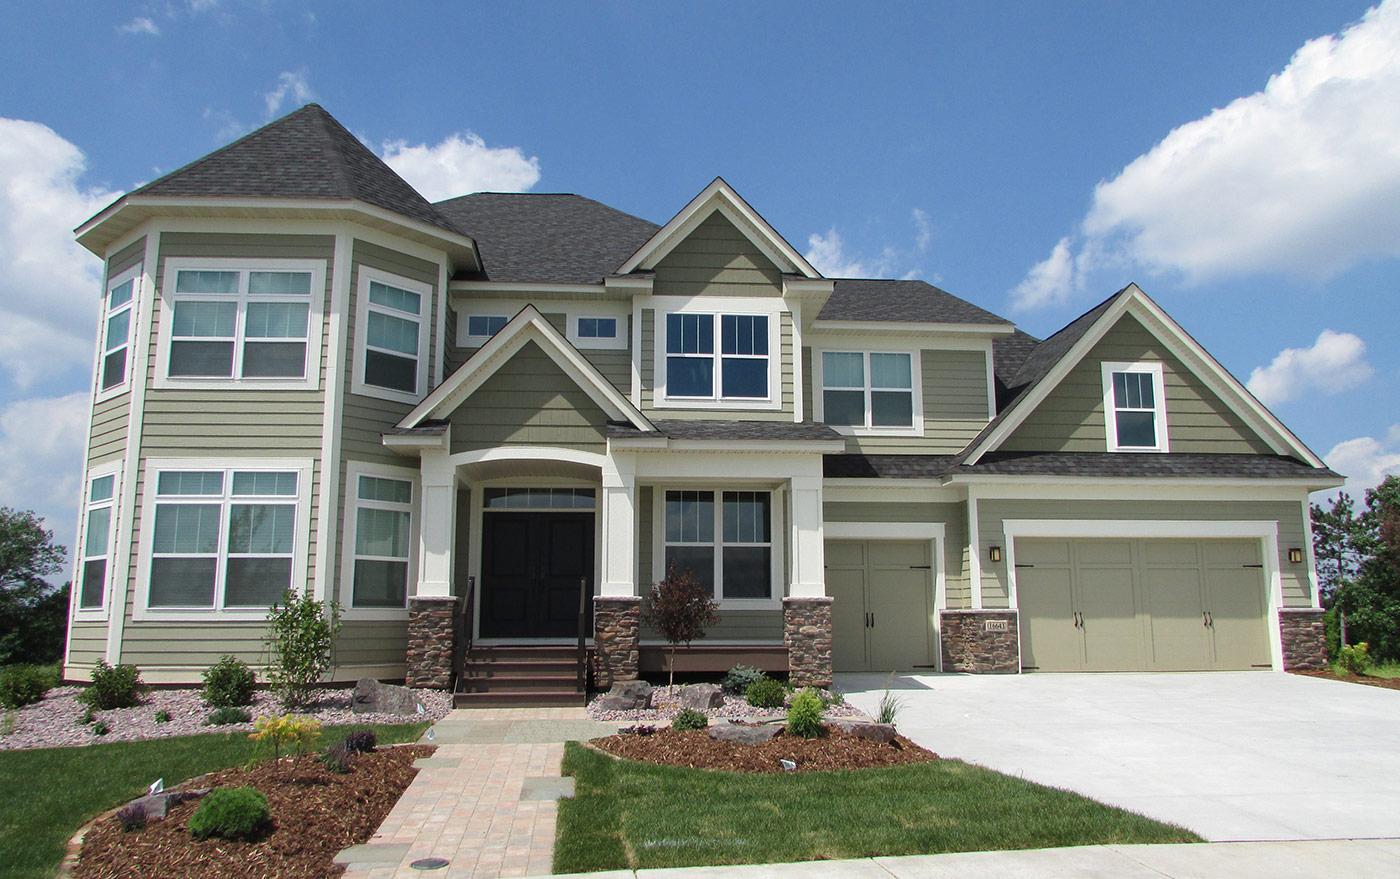 Custom Home Builders & New Home